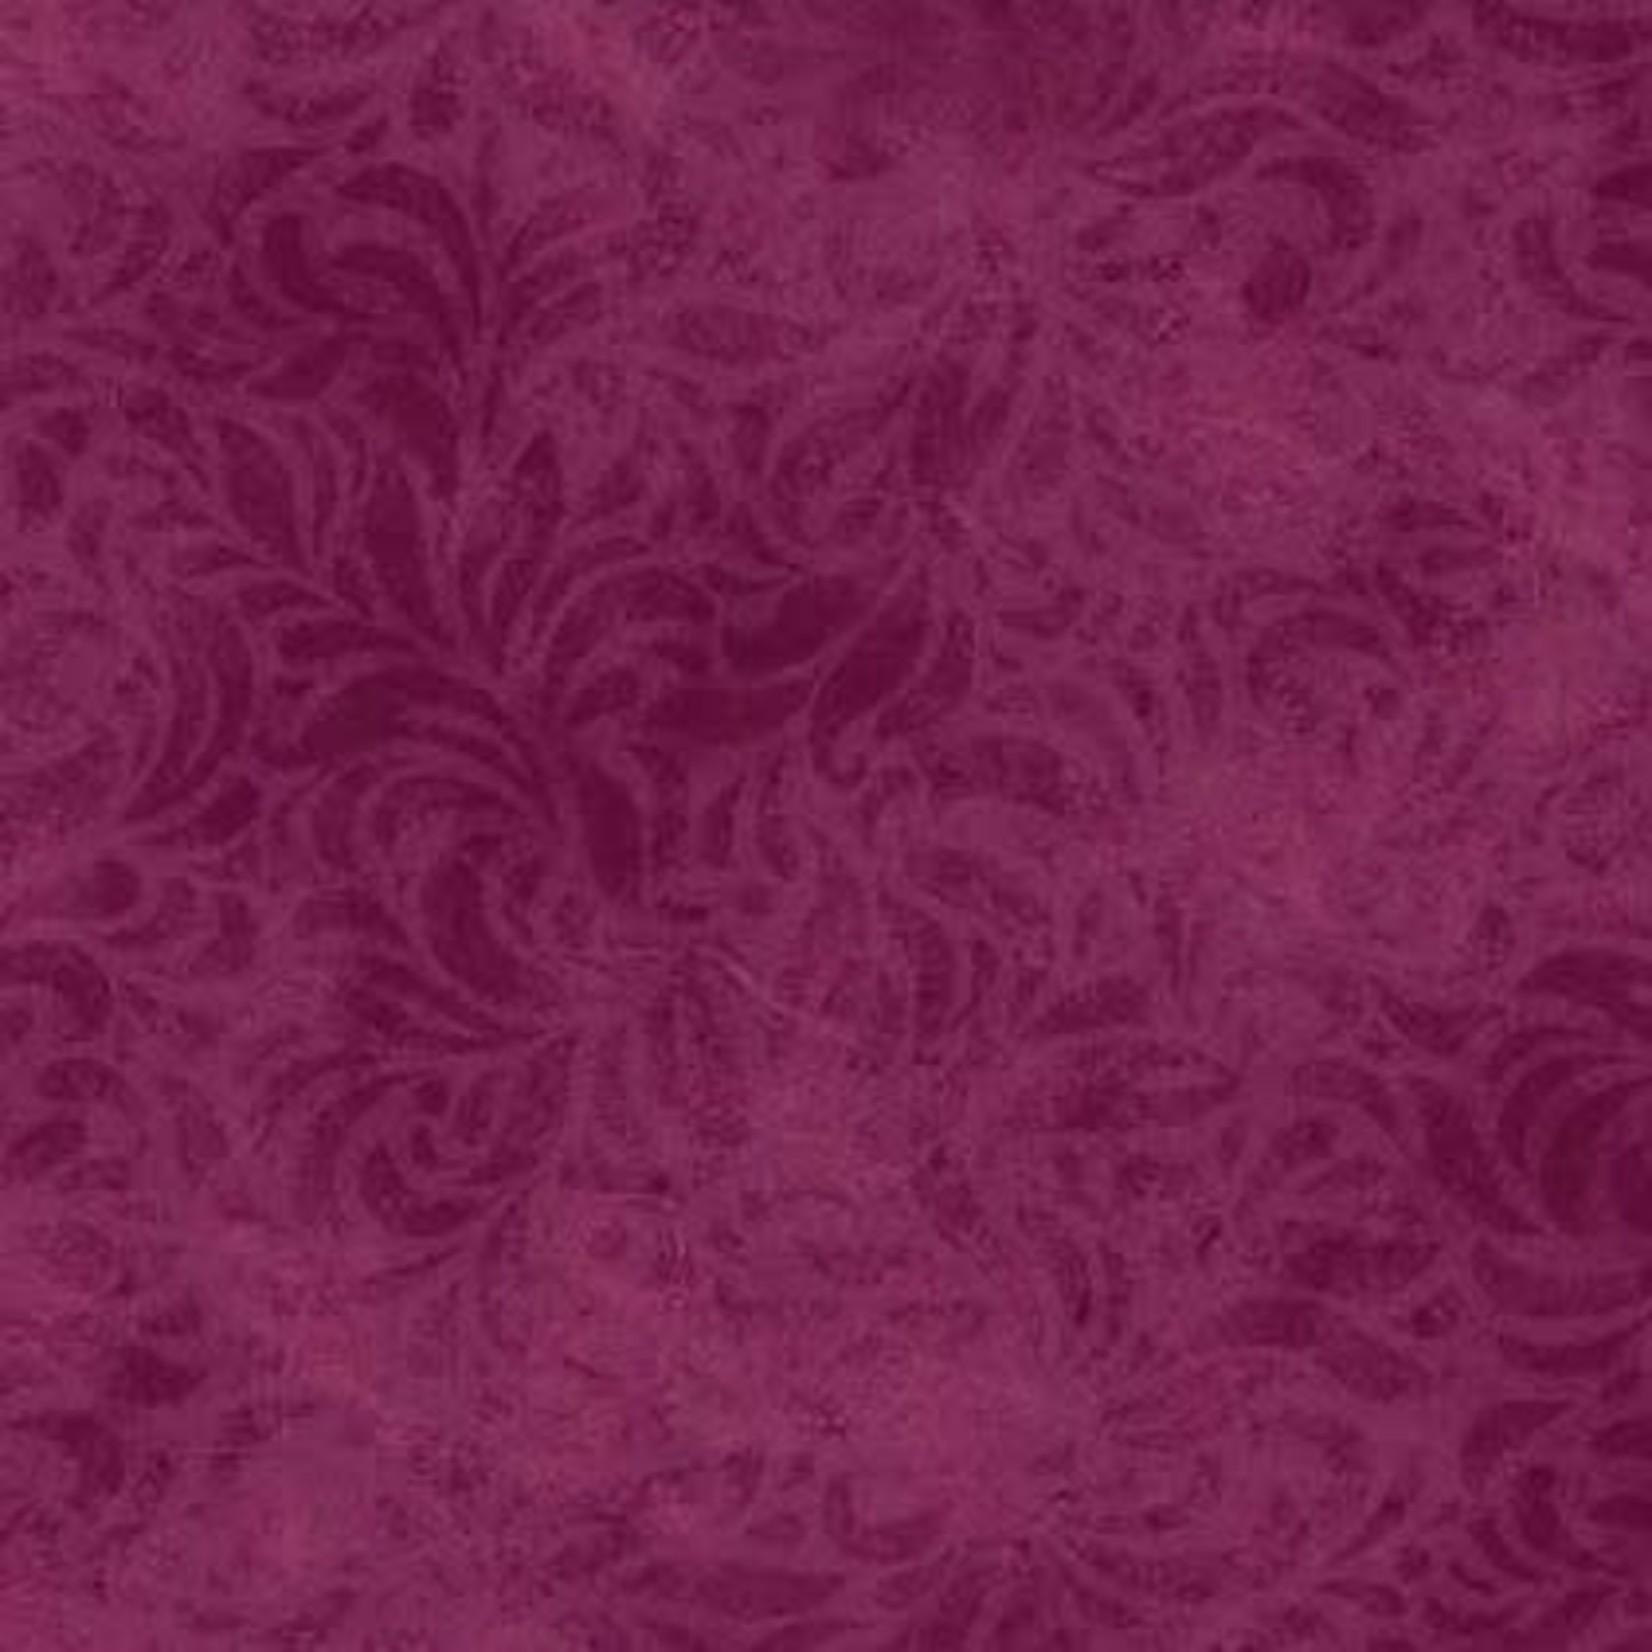 P&B Textiles Bella Suede - Burgundy